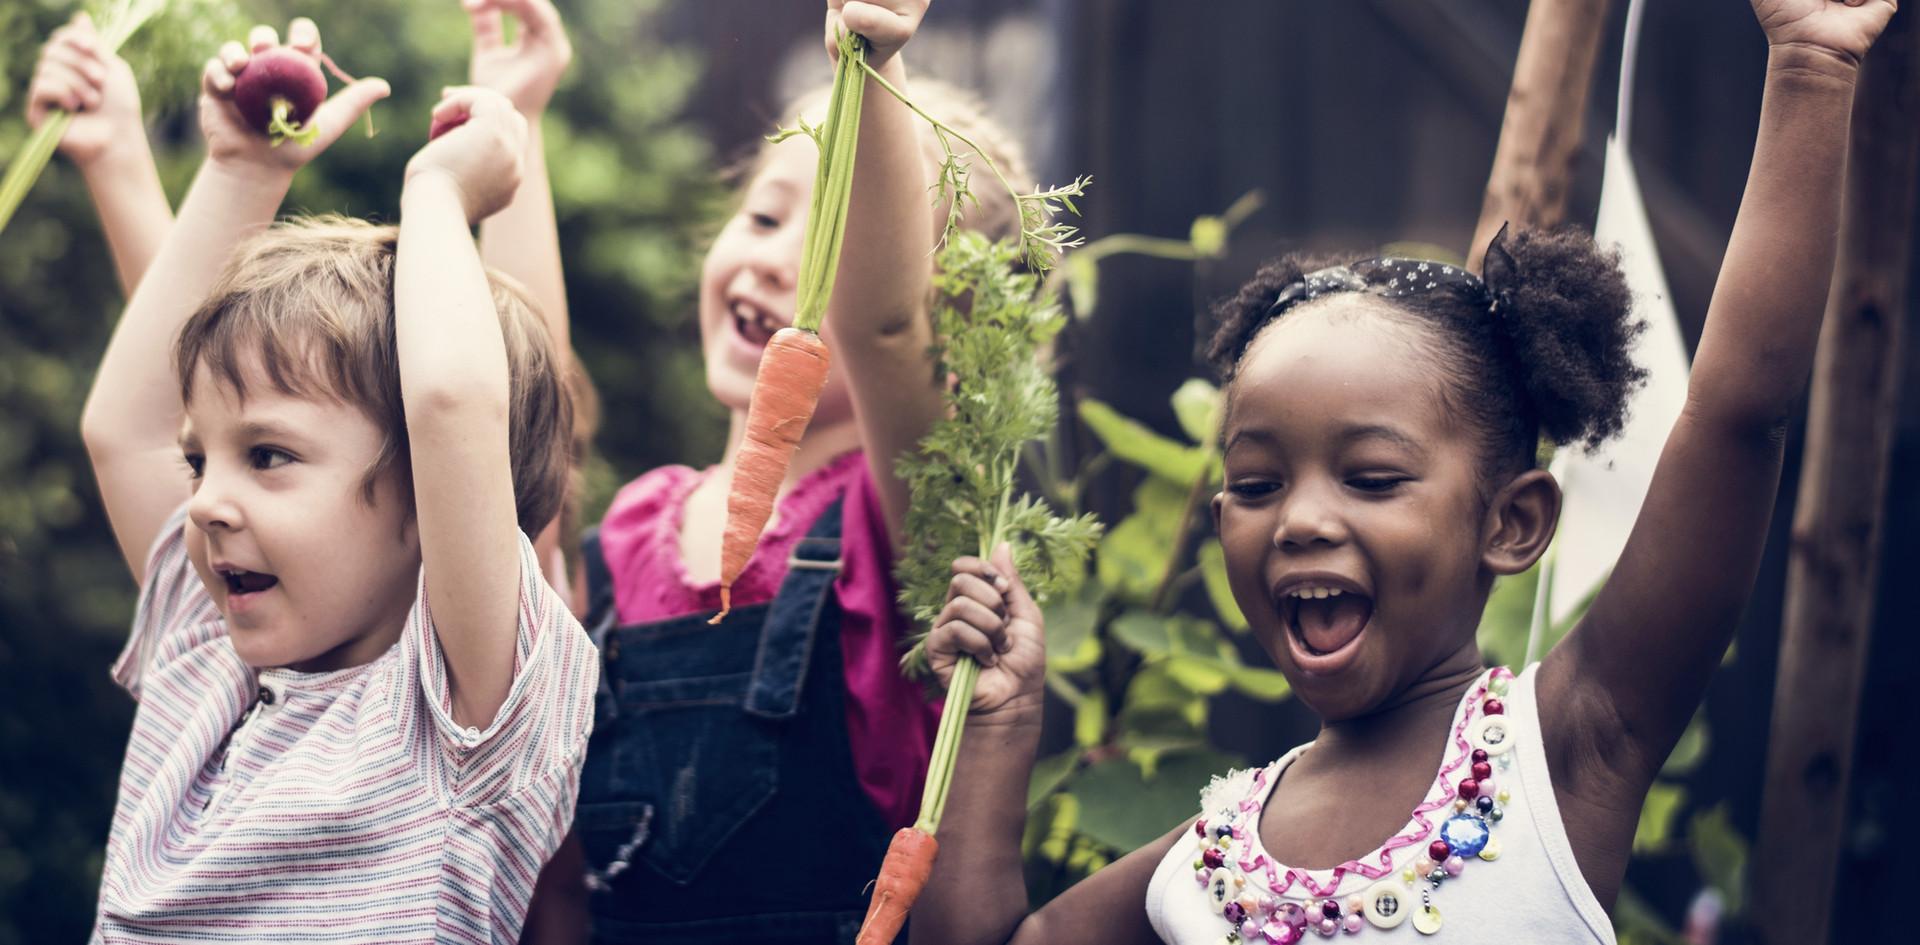 Kids in Vegetable Farm